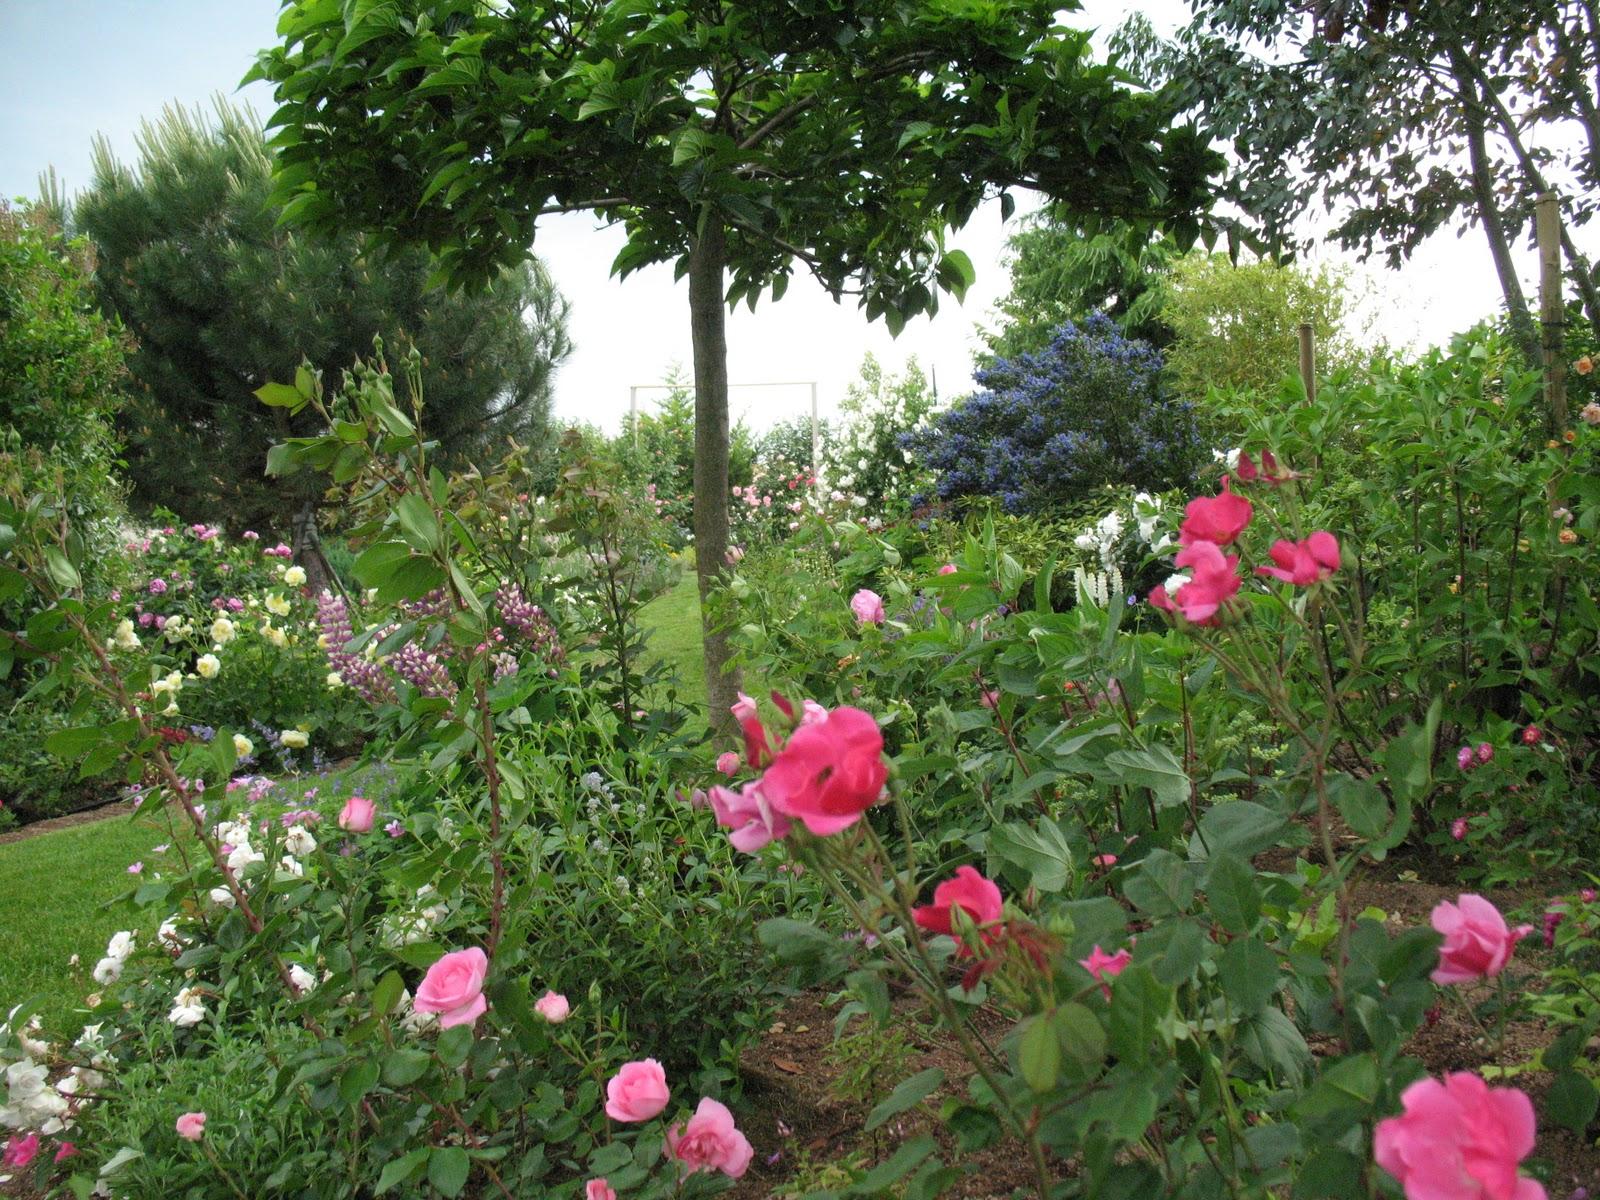 Roses du jardin ch neland l 39 volution du jardin - Jardin de chen ...